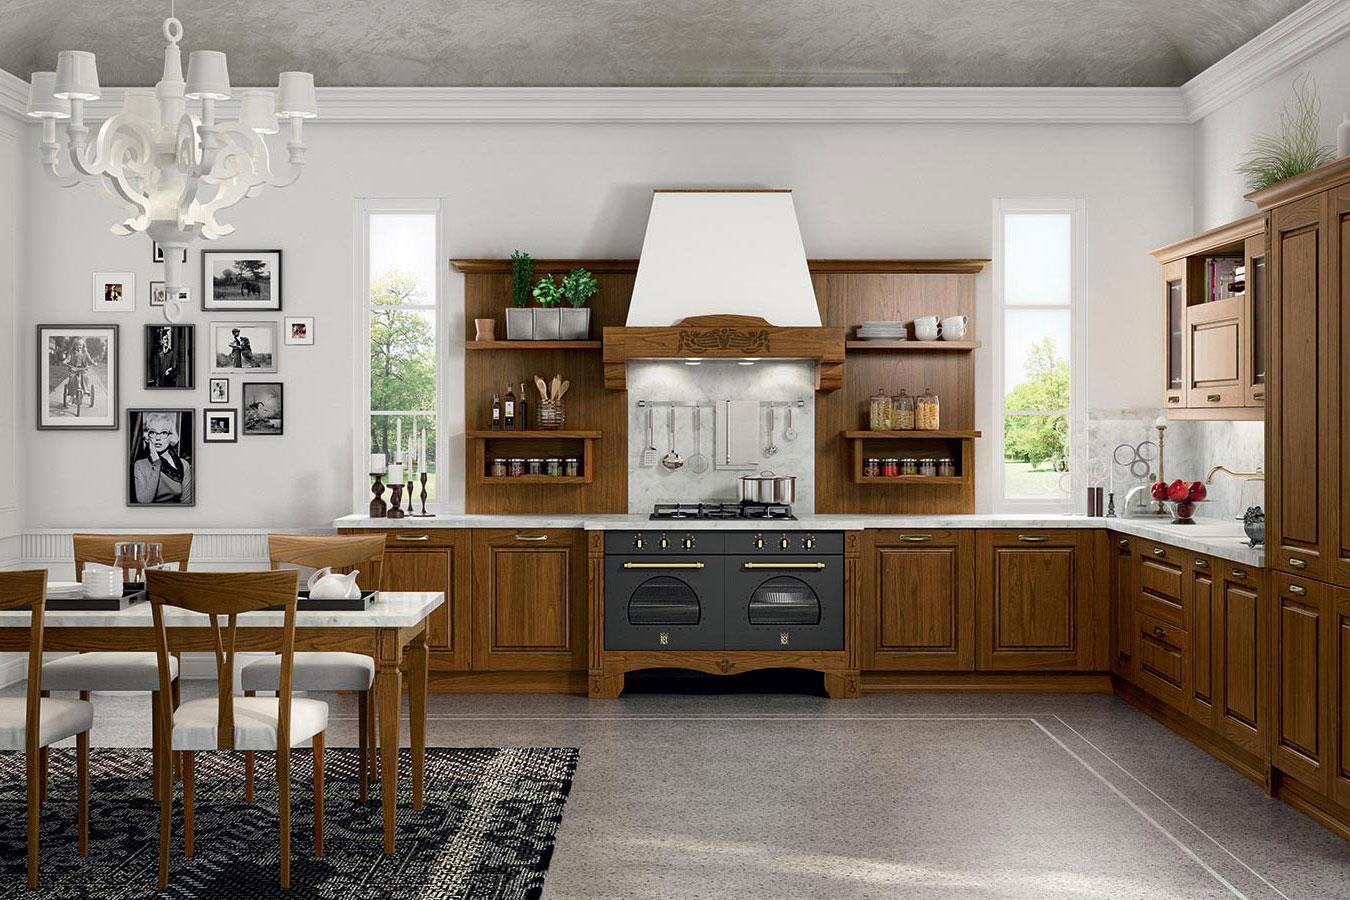 Cucina classica verona di arredo3 righetti mobili novara for Cucine classiche arredo 3